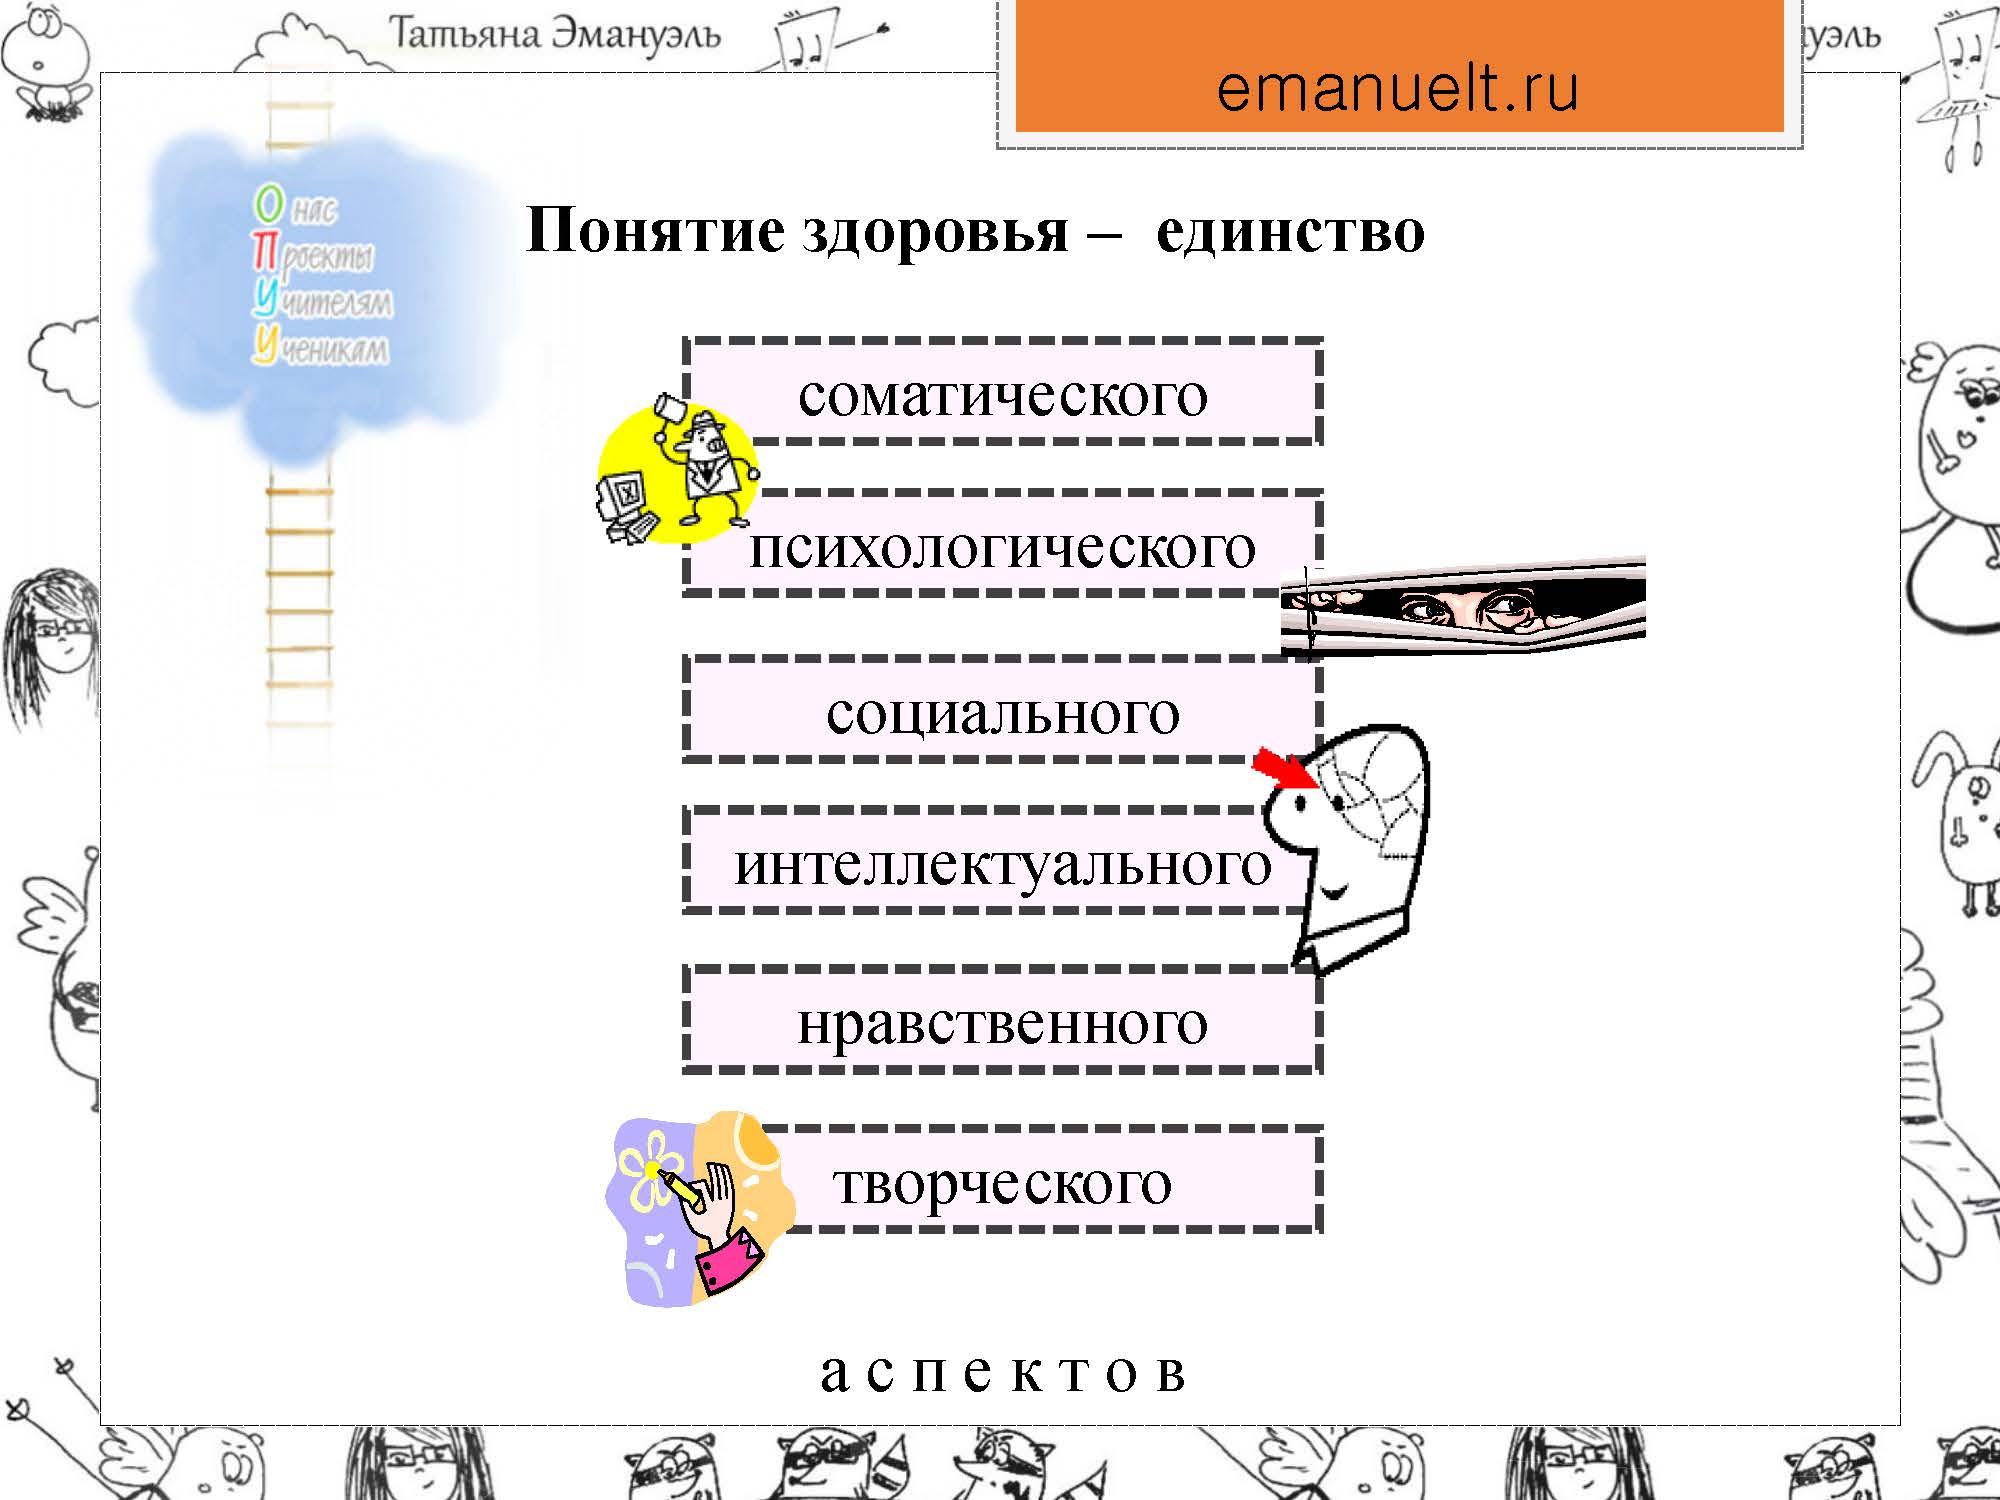 RazBeG_Emanuel_Страница_03